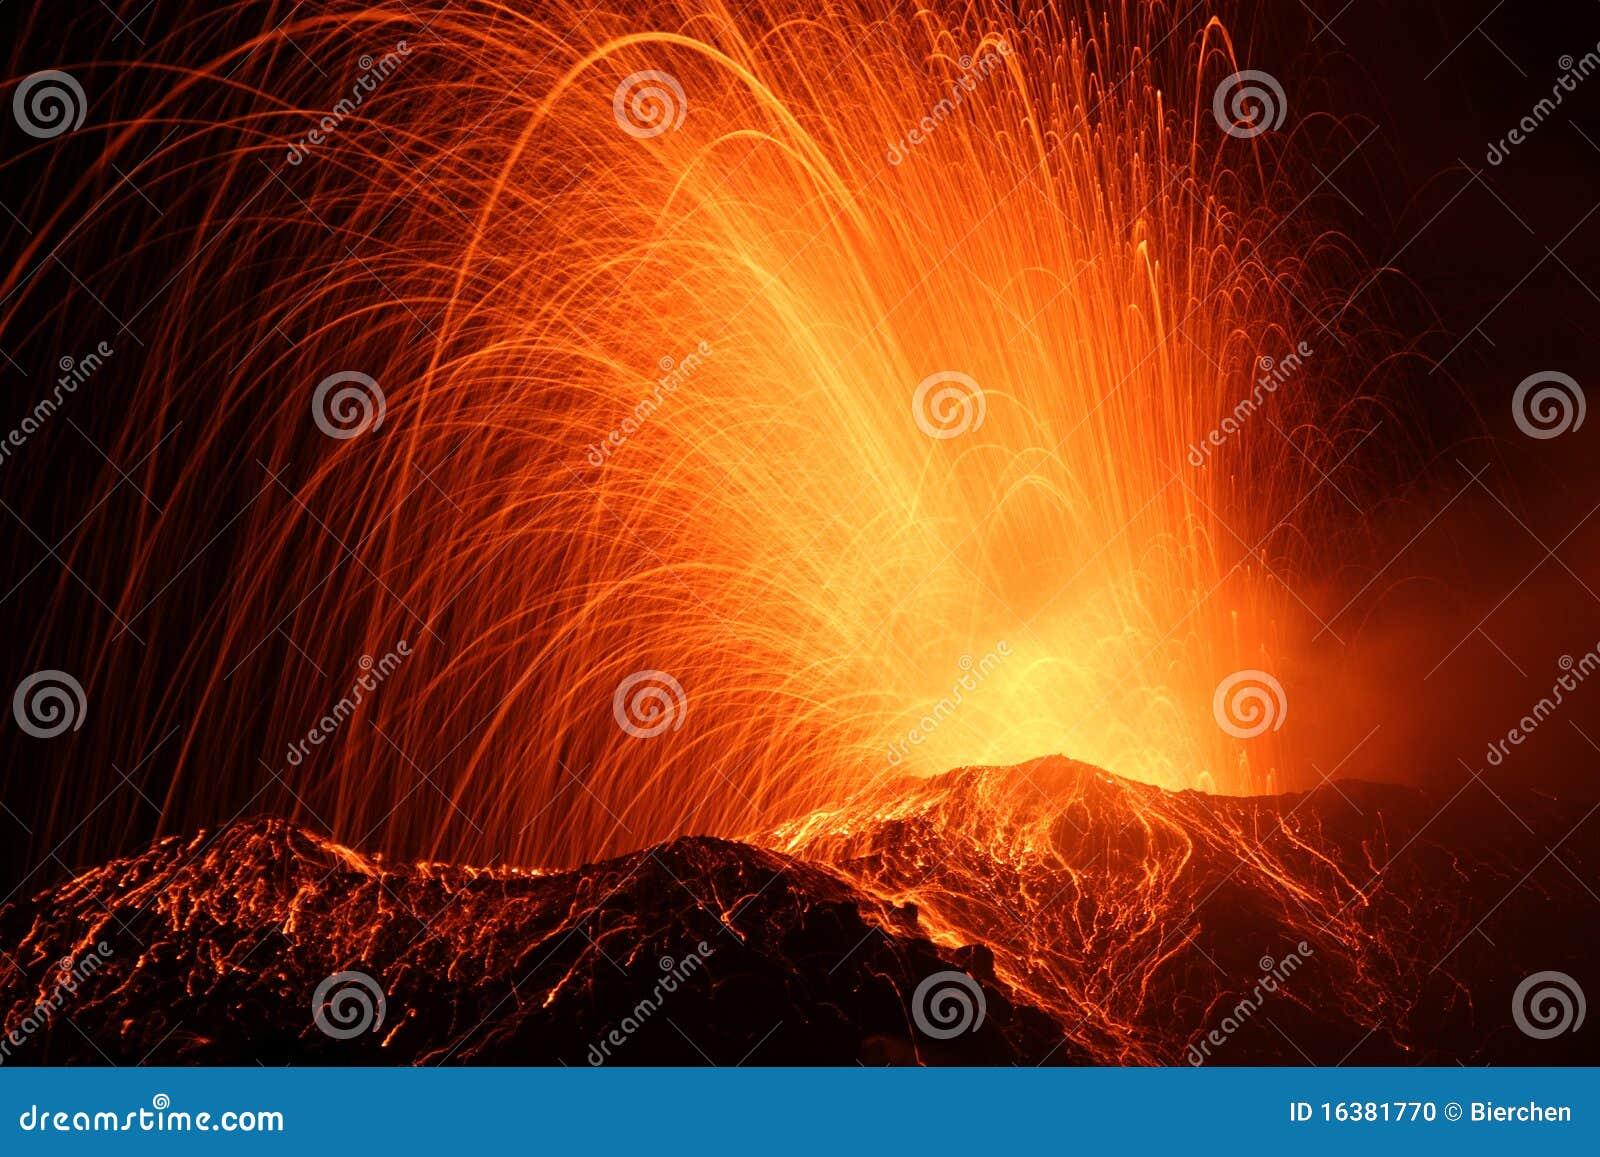 Eruption des Vulkan stromboli